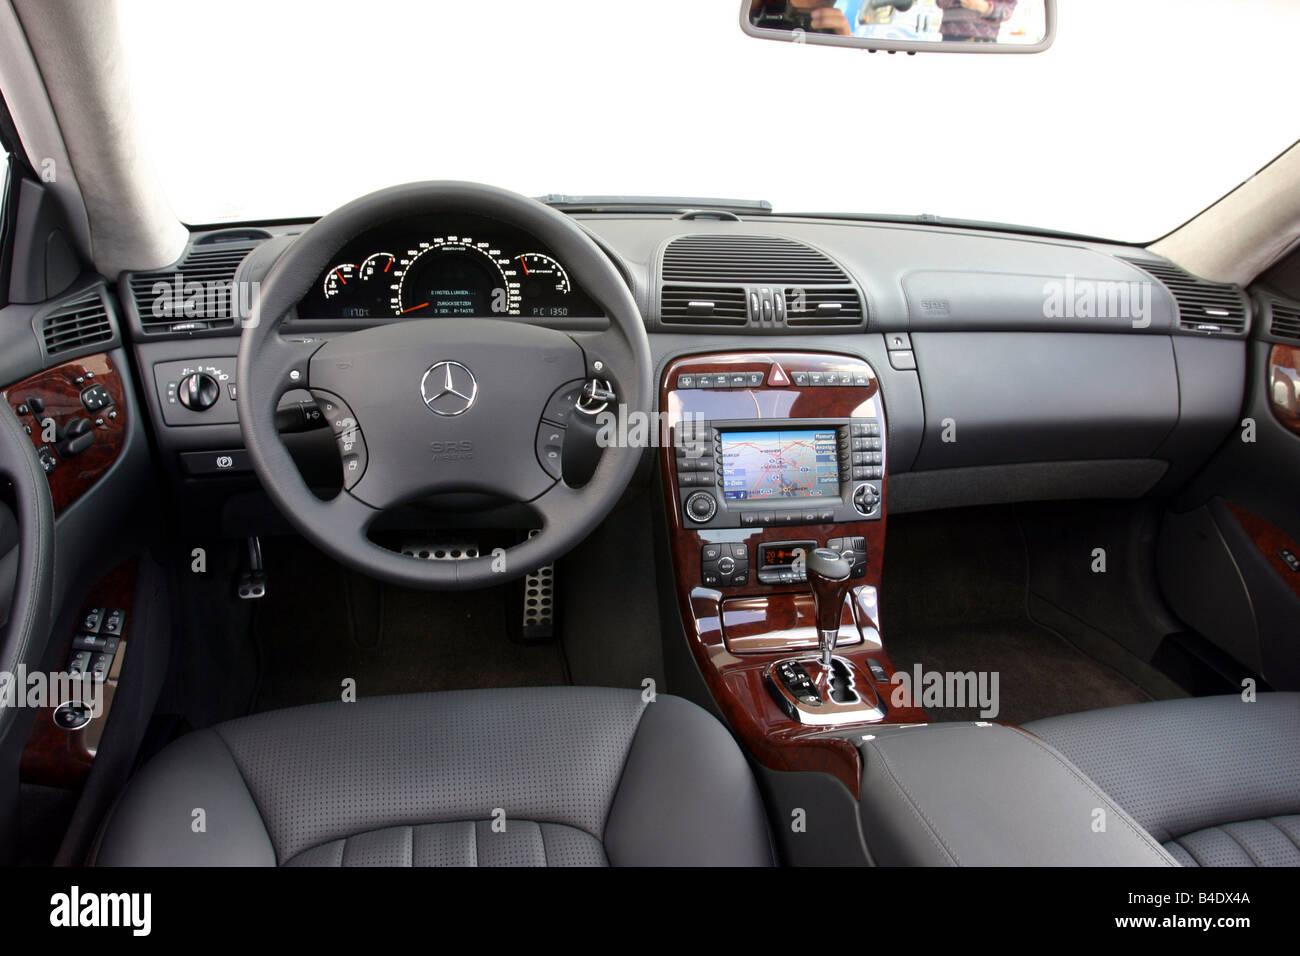 Auto cockpit mercedes  Auto, Mercedes CL 65 AMG, Baujahr 2003, Silber, Limousine, innere ...